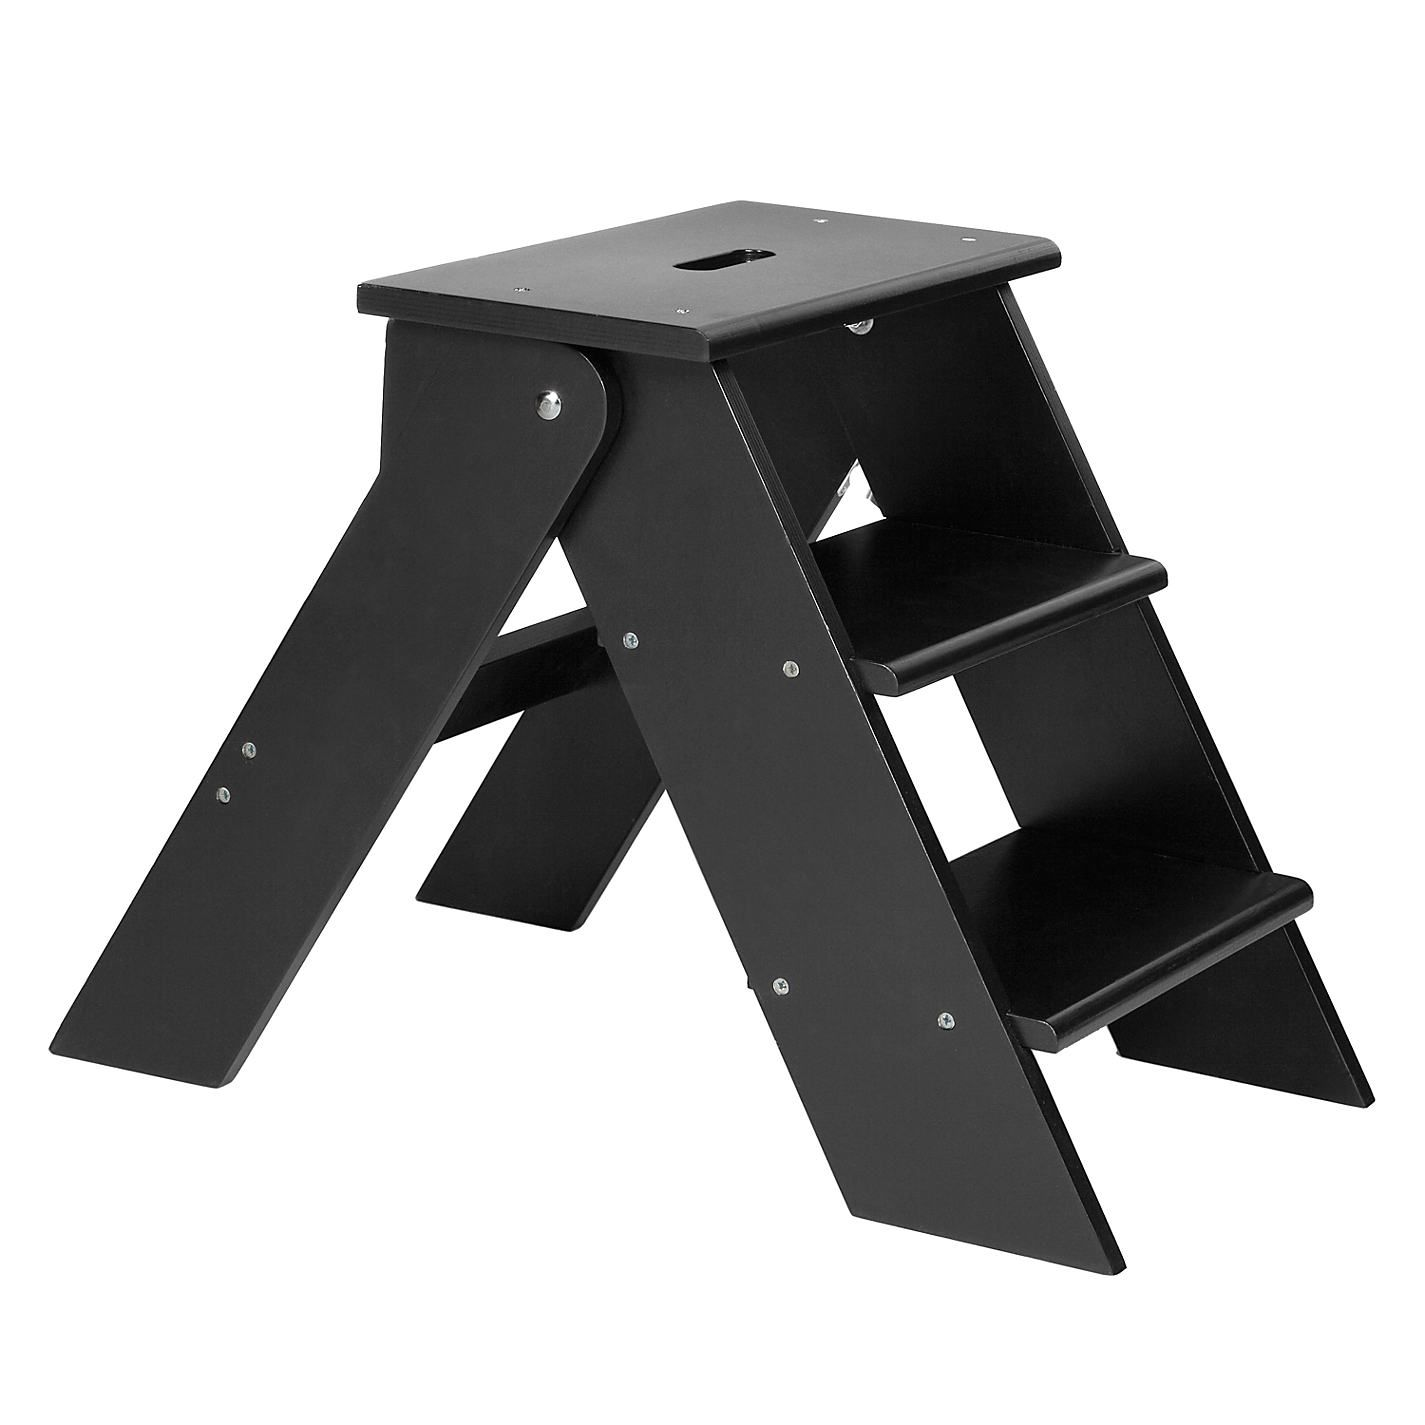 Folding Step Ladders Folding step stool  sc 1 st  Pinterest & Folding Step Ladders Folding step stool | step ladders | Pinterest ... islam-shia.org